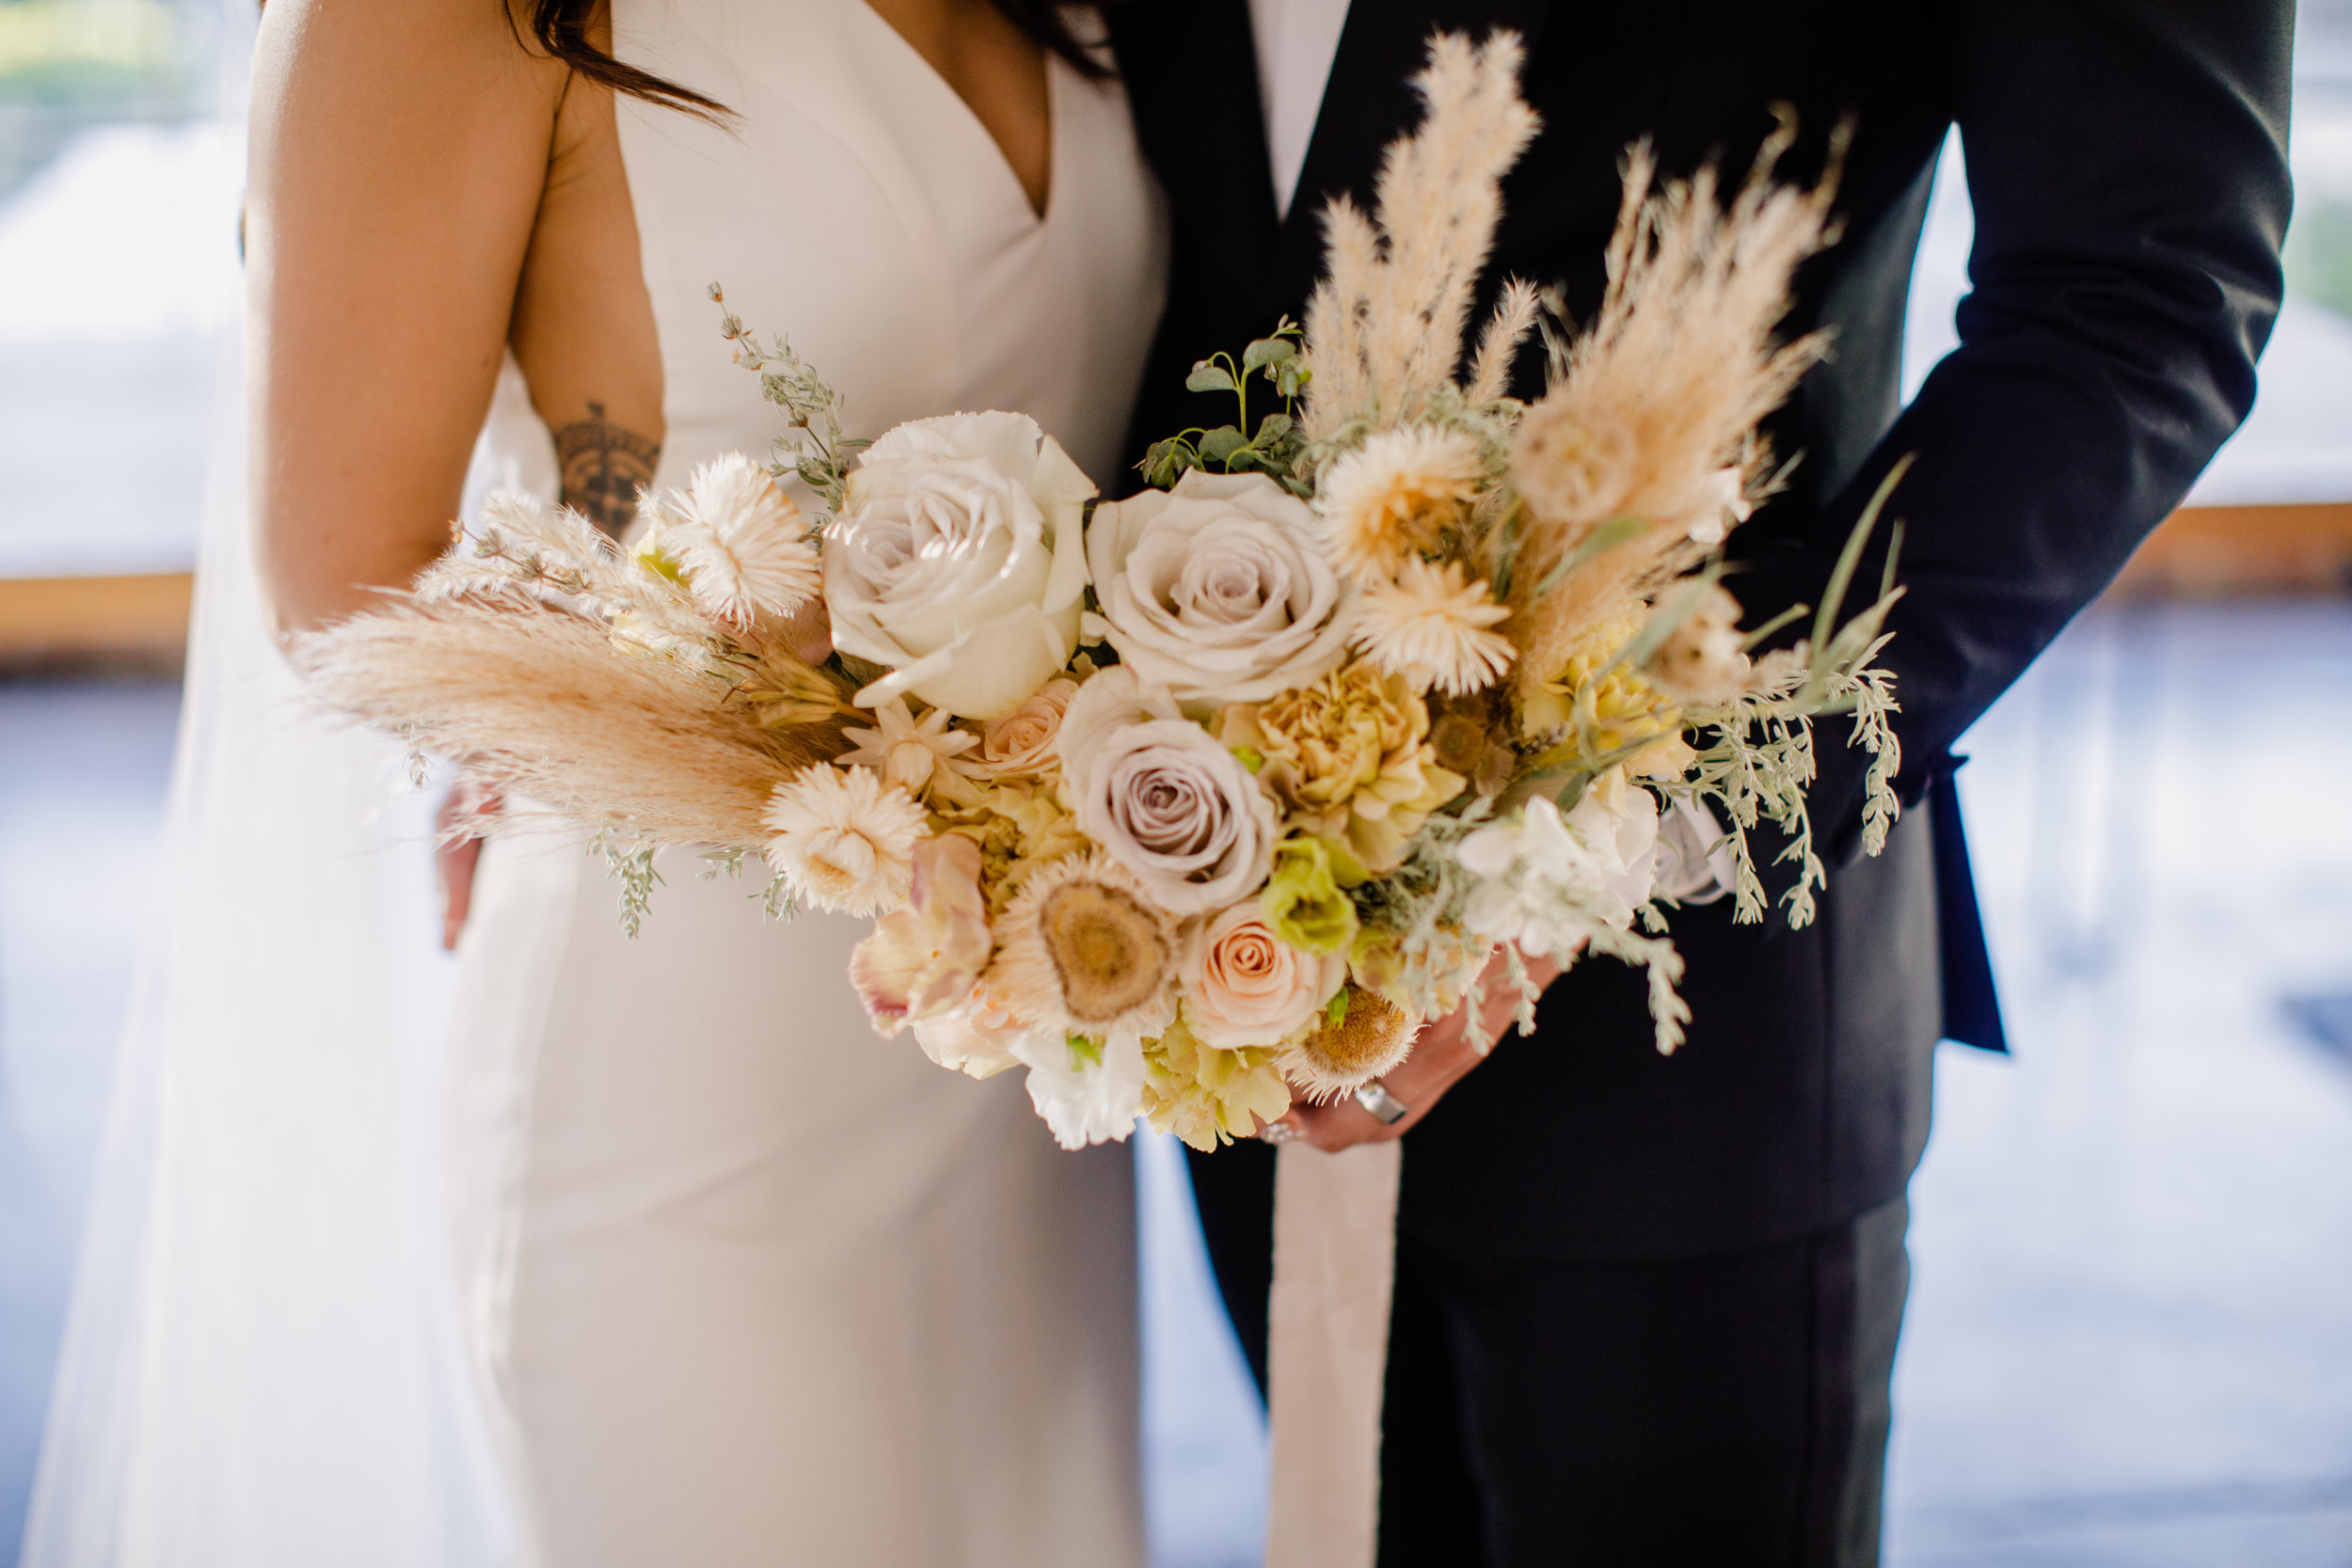 Dried_Flower_Wedding_Bouquet_Sibyl_Sophia_Des_Moines_Iowa.jpg.jpg